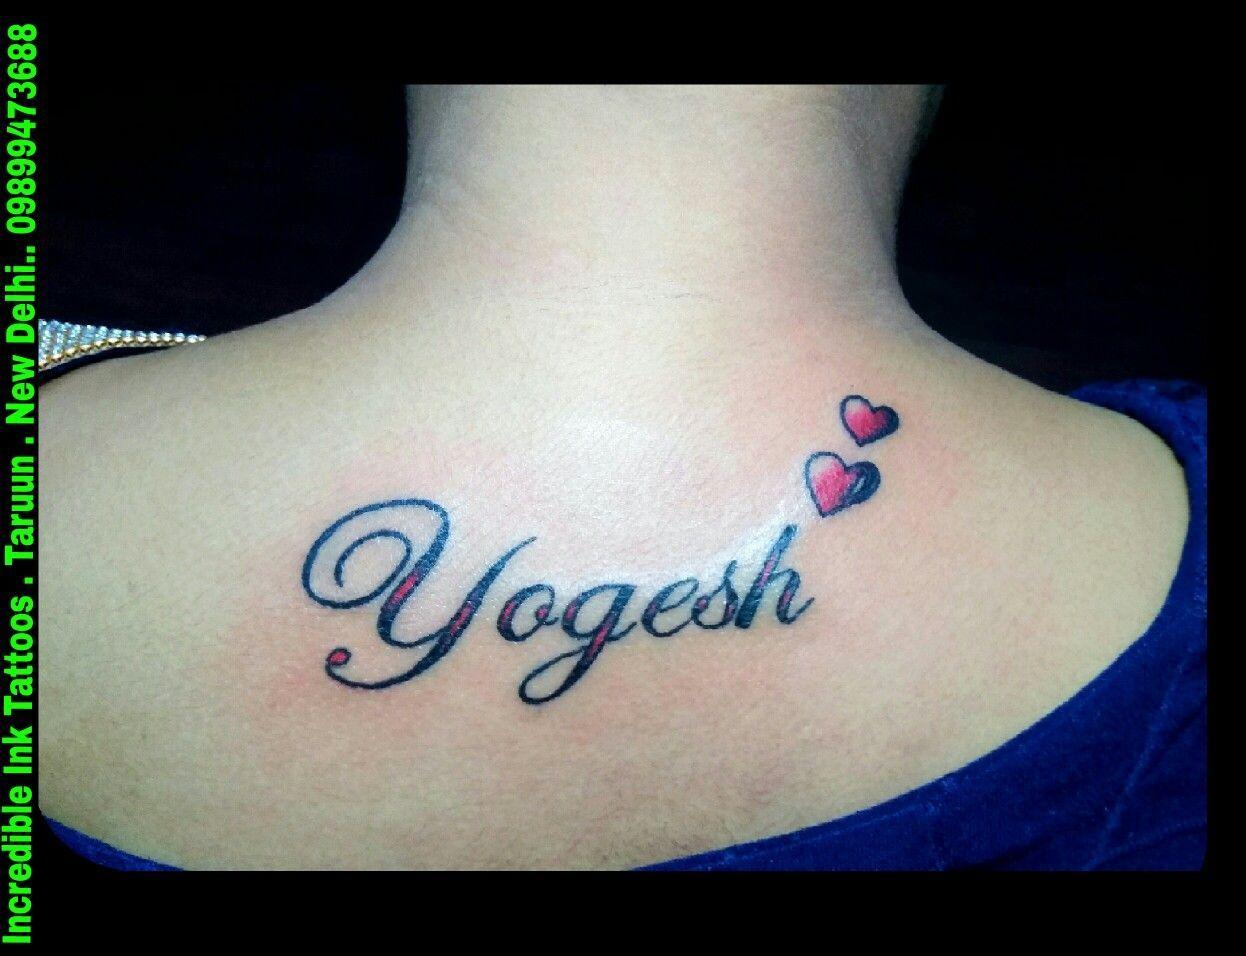 Pin By Jennifer Hanome On Tatuaggi In 2020 Name Tattoo Designs Name Tattoos Tattoos